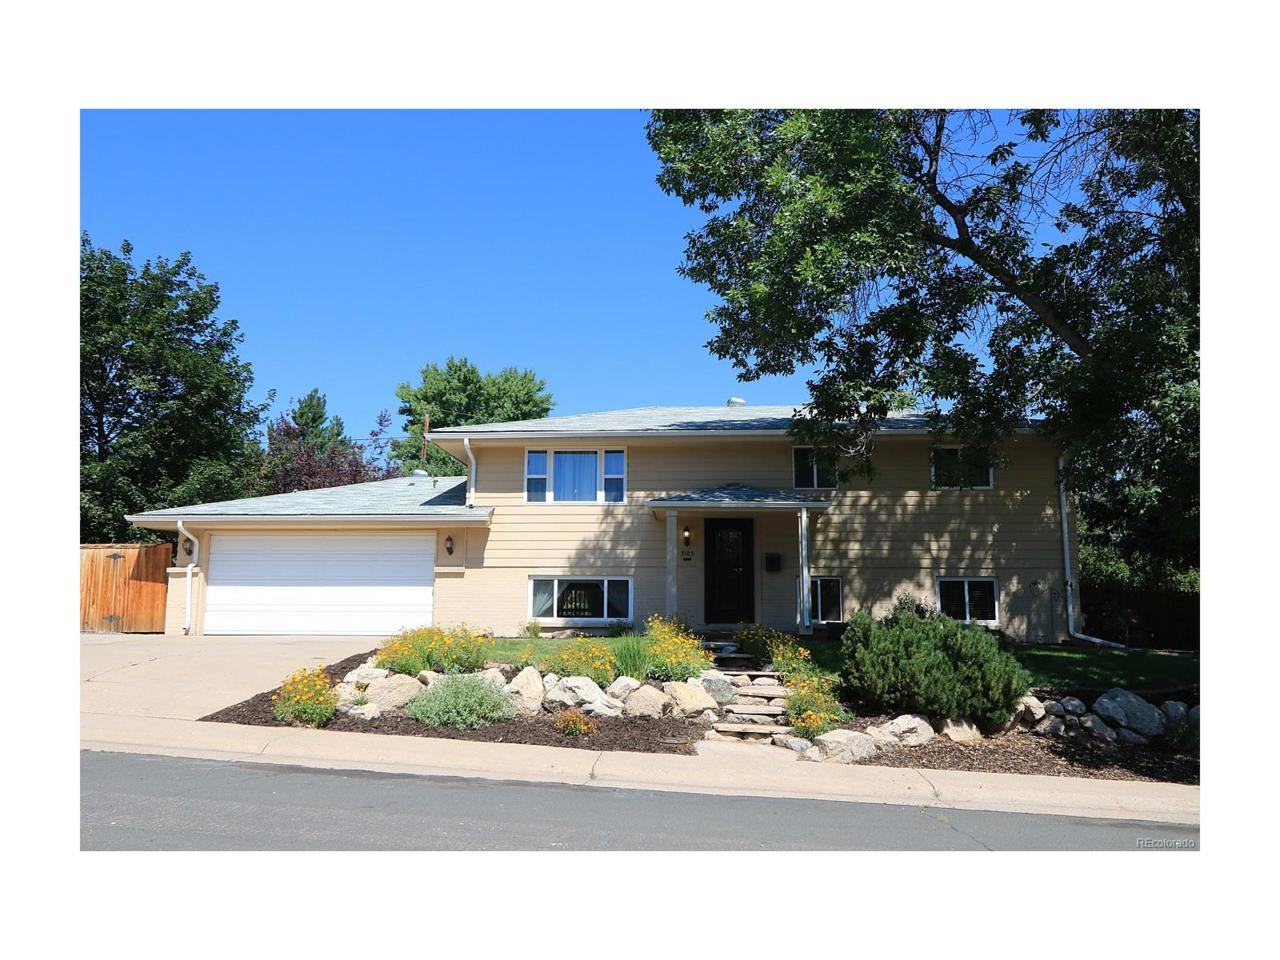 5105 S Osceola Street, Littleton, CO 80123 (MLS #3042026) :: 8z Real Estate